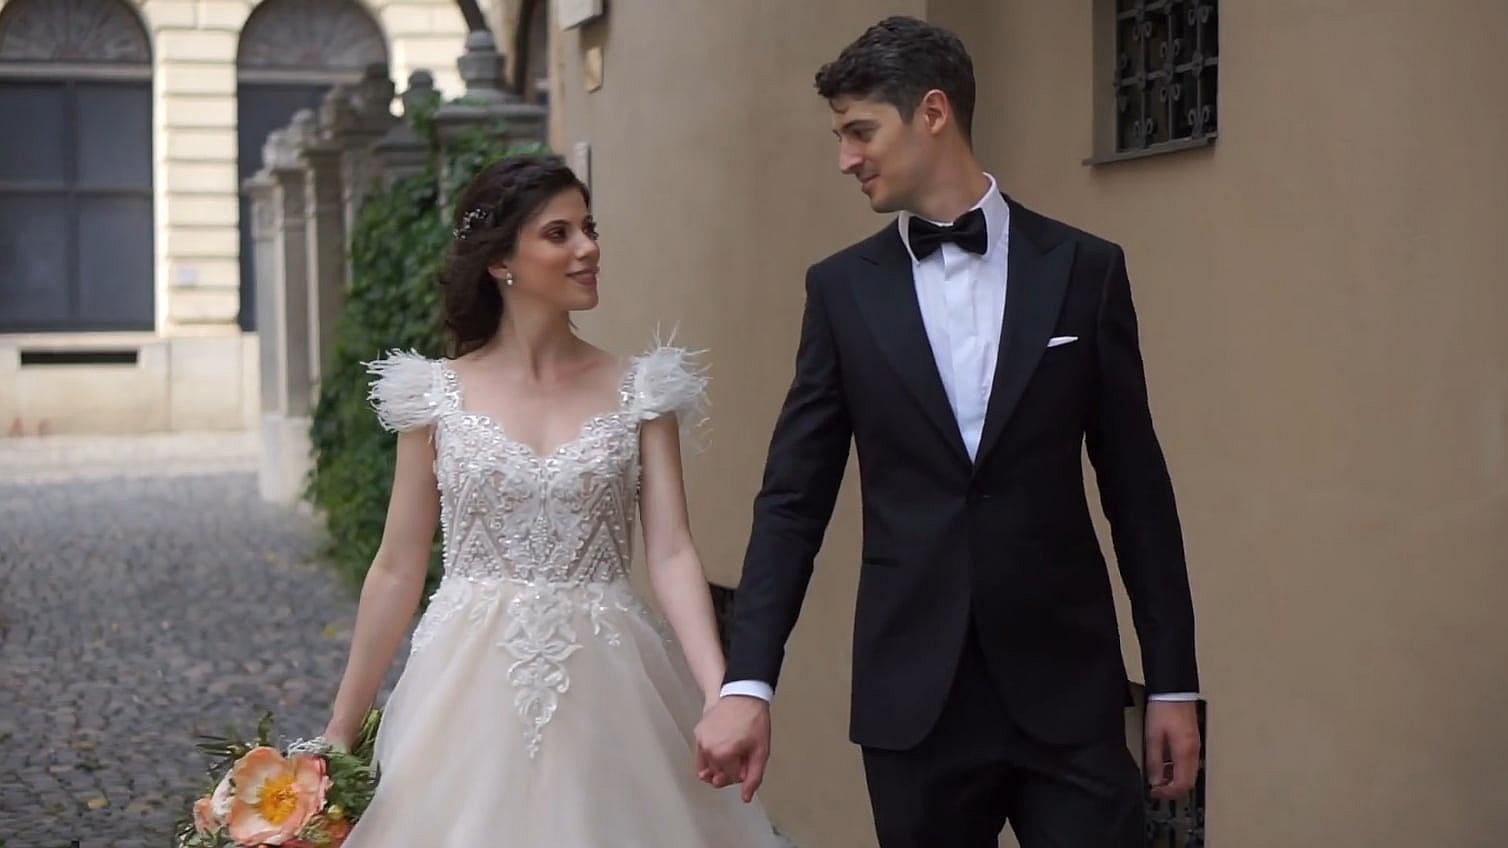 Videografie nunta filmare cununie